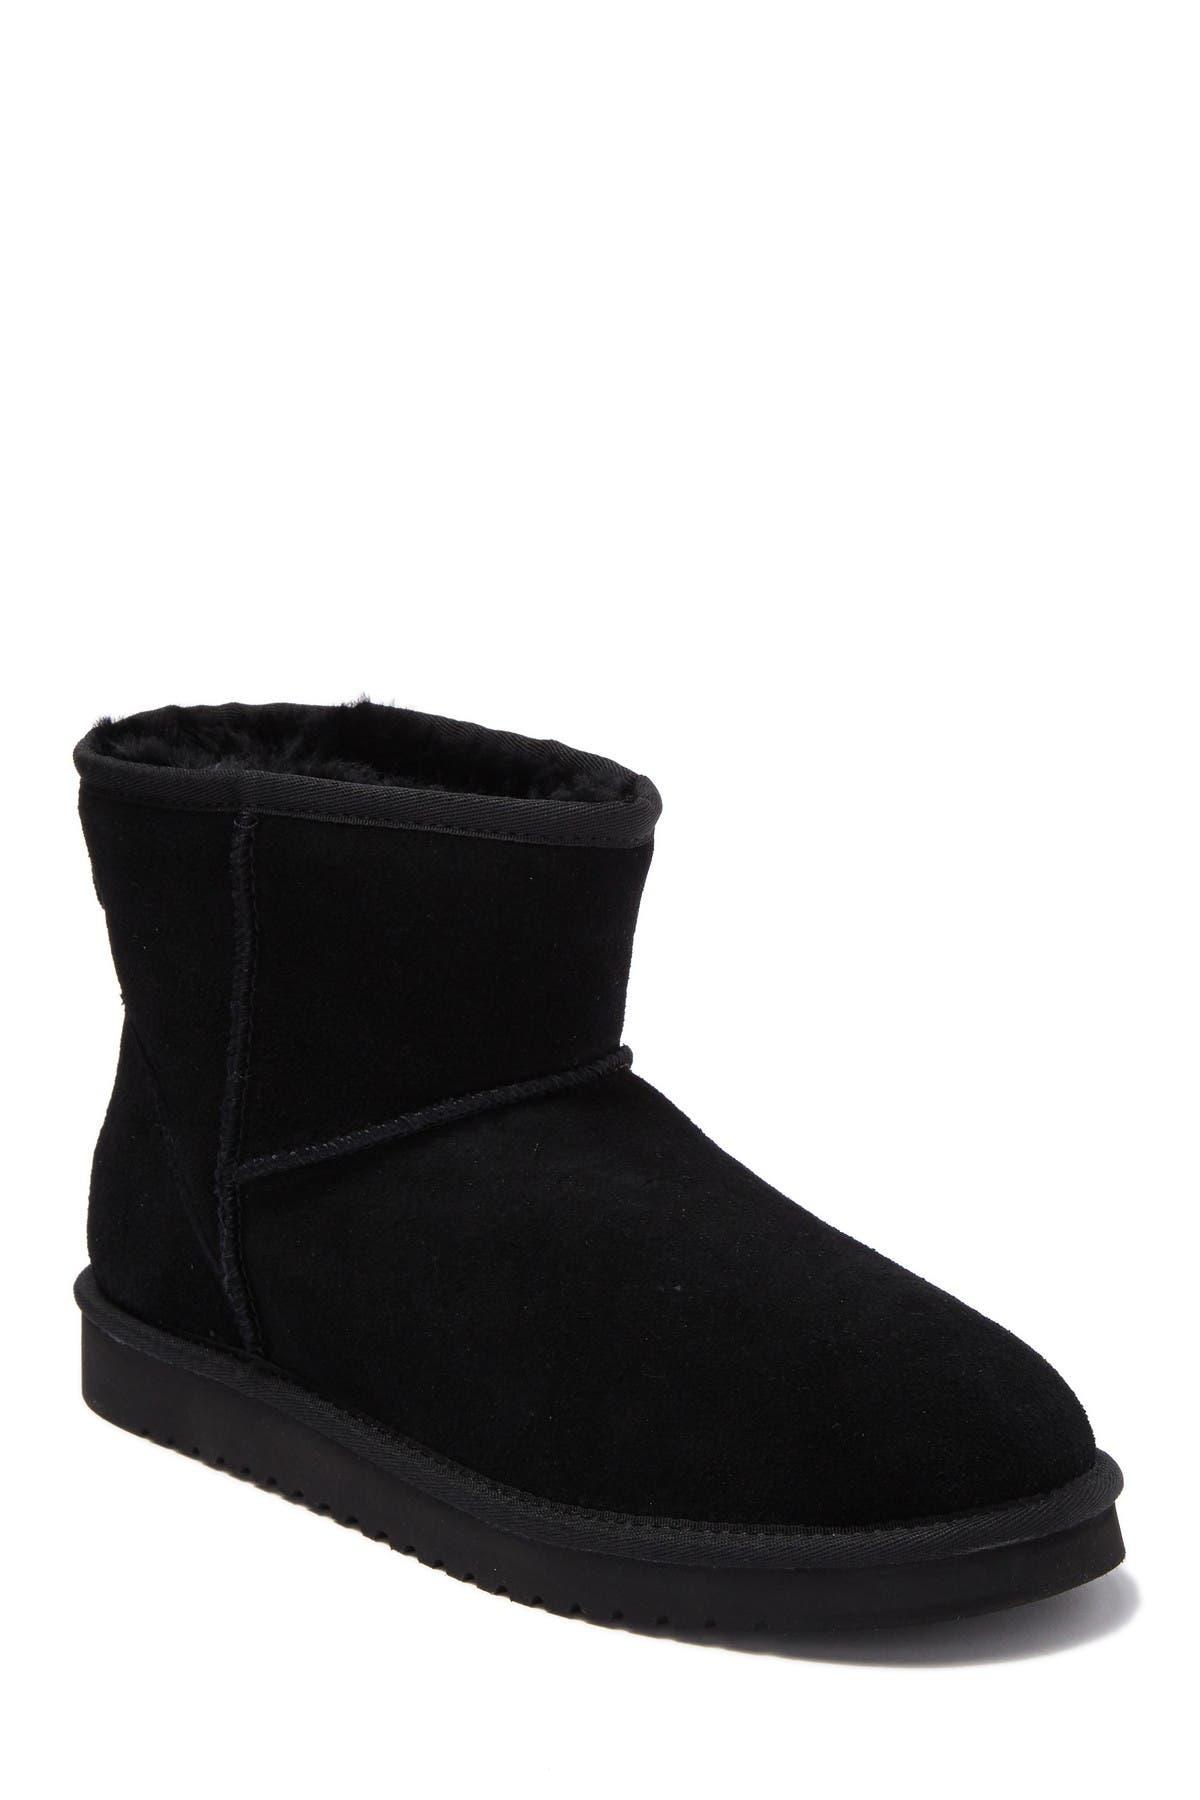 Image of KOOLABURRA BY UGG Burra Mini Faux Fur Lined Boot